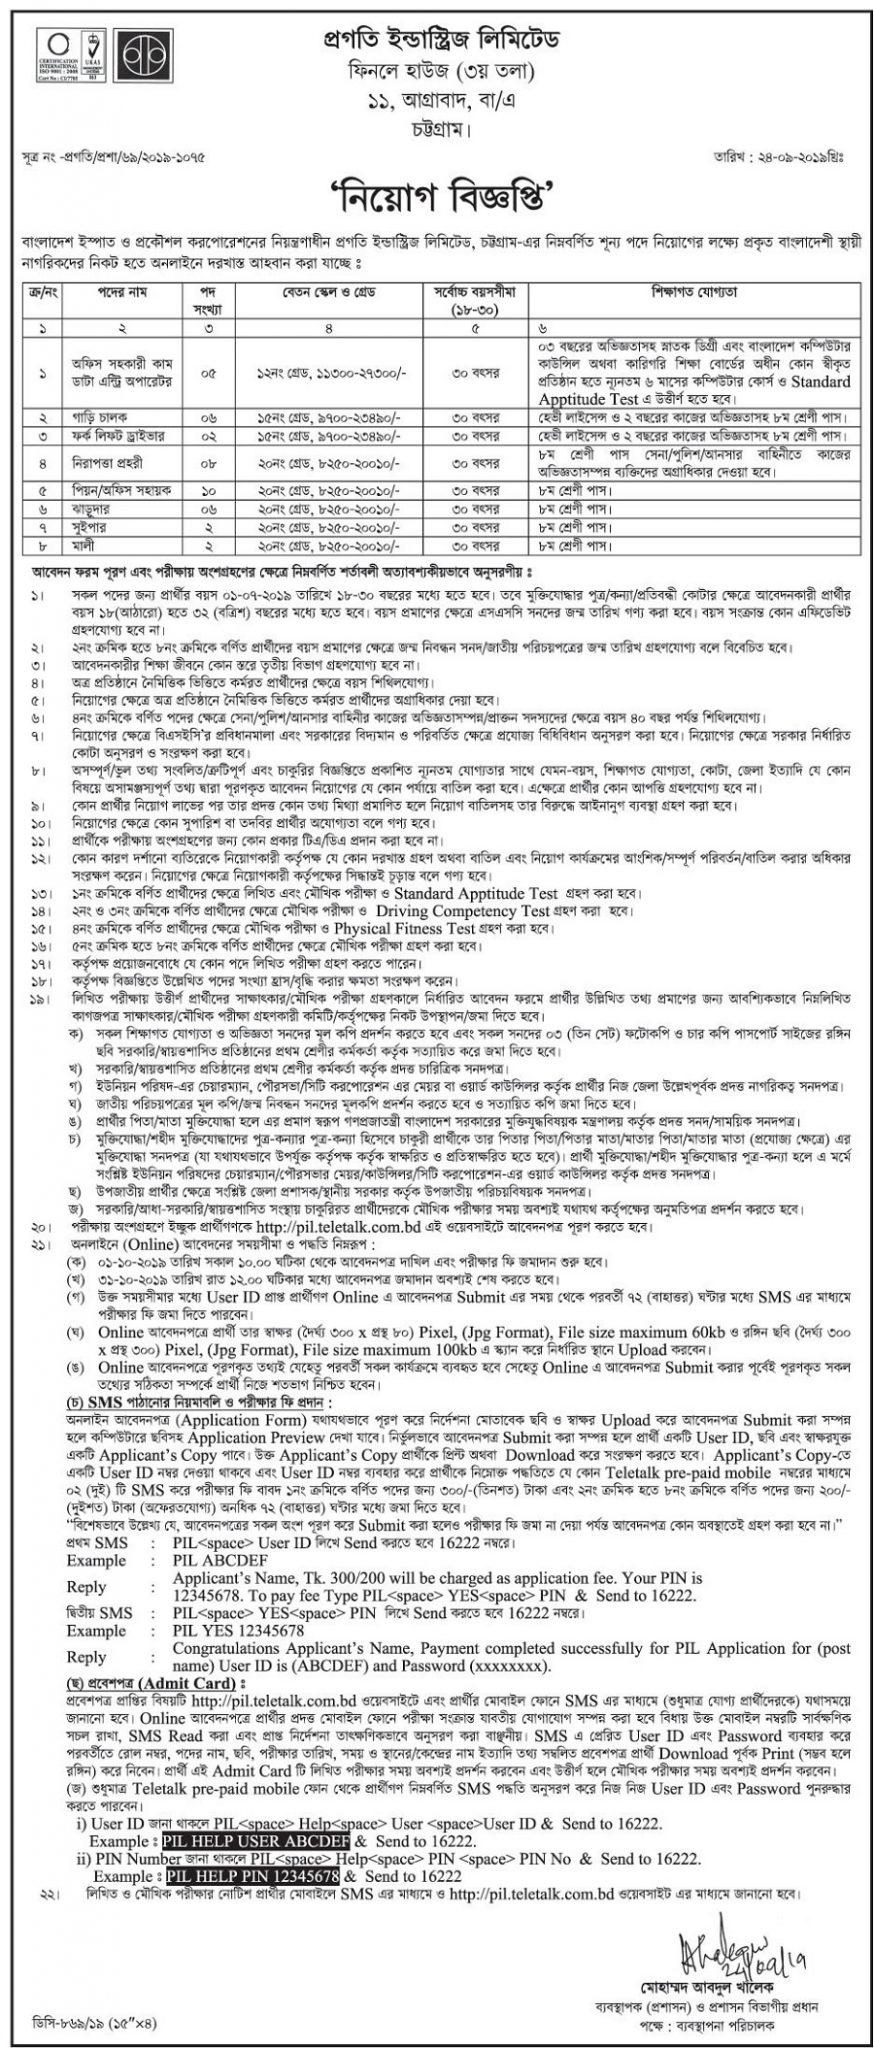 Pragoti Industries Limited Job Circular 2019